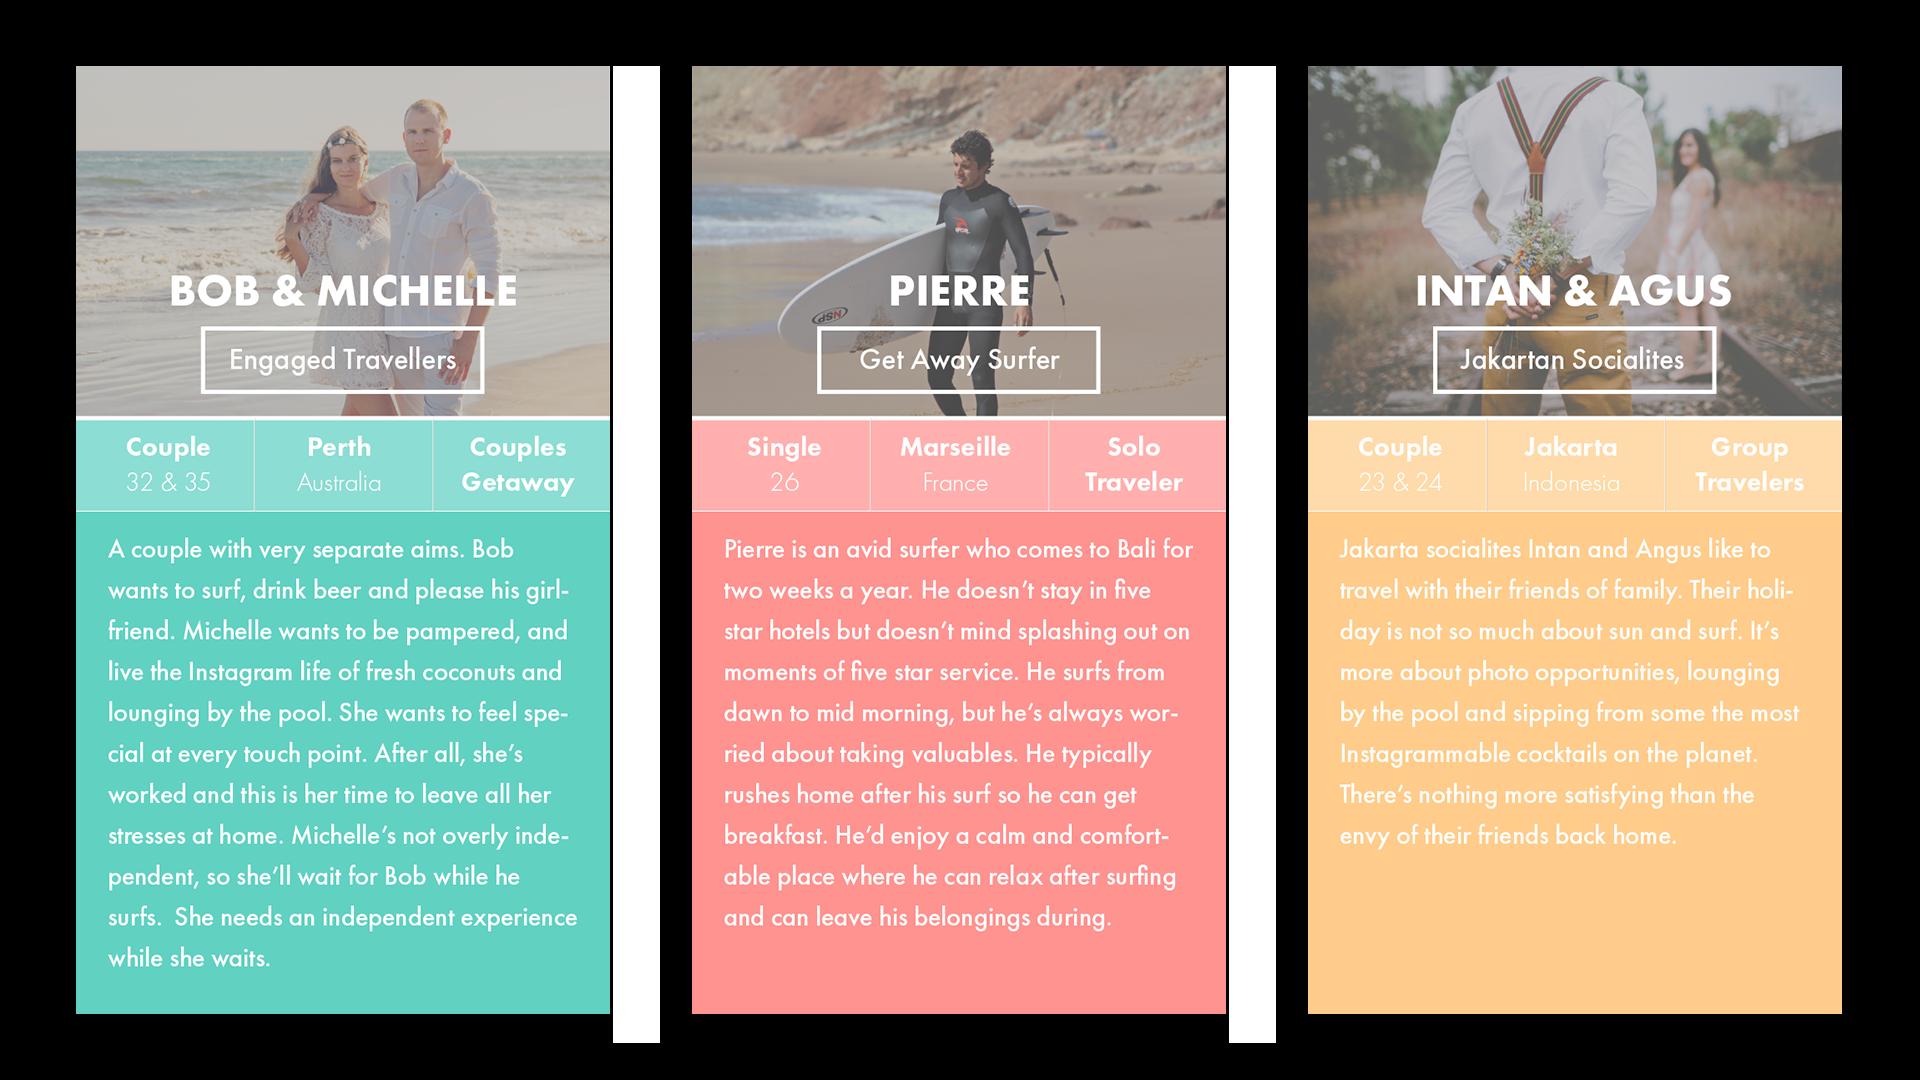 Sample user profile sumaries